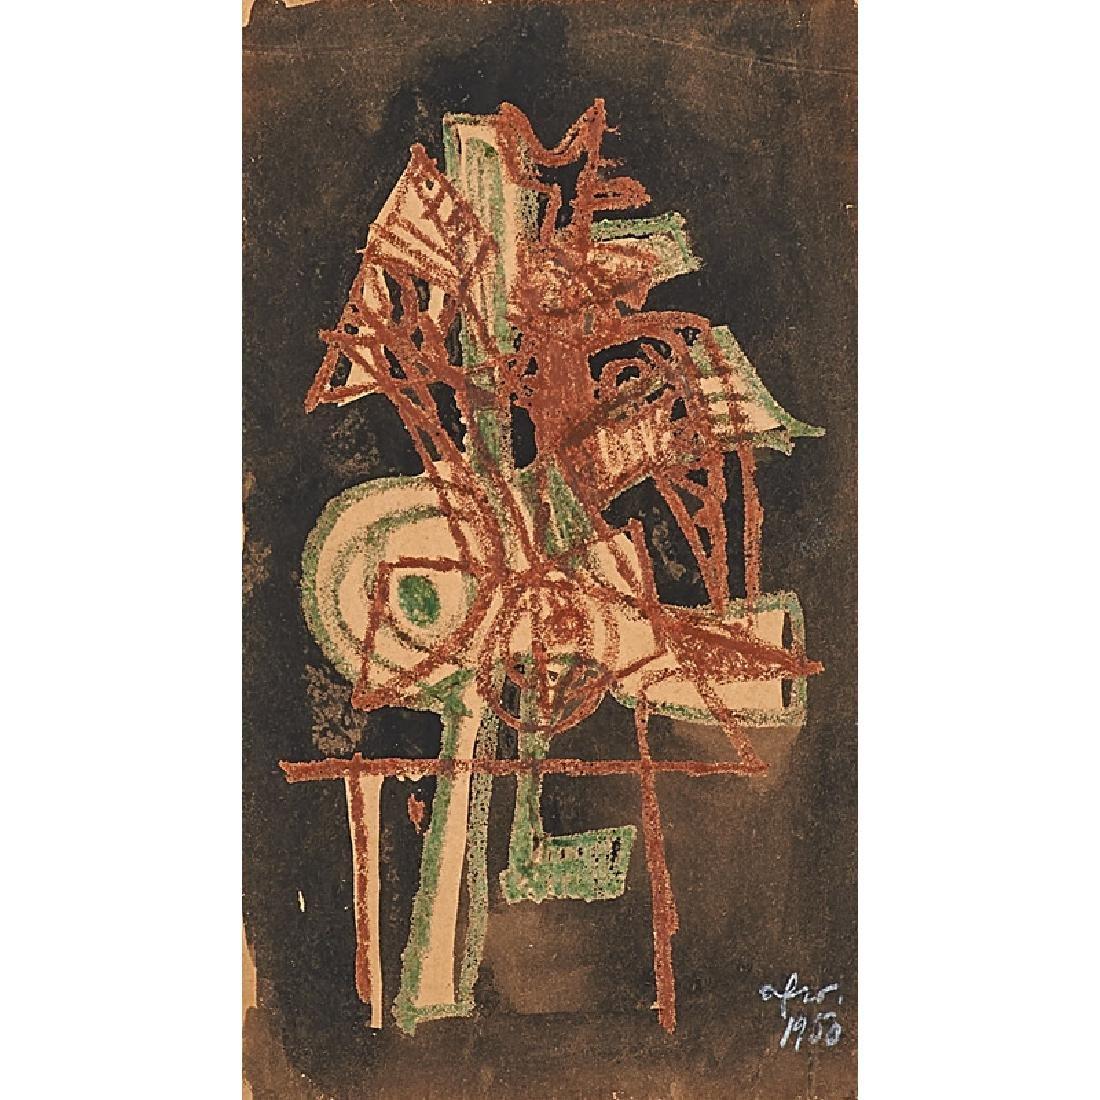 Afro (Afro Basaldella) (Italian, 1912-1976)